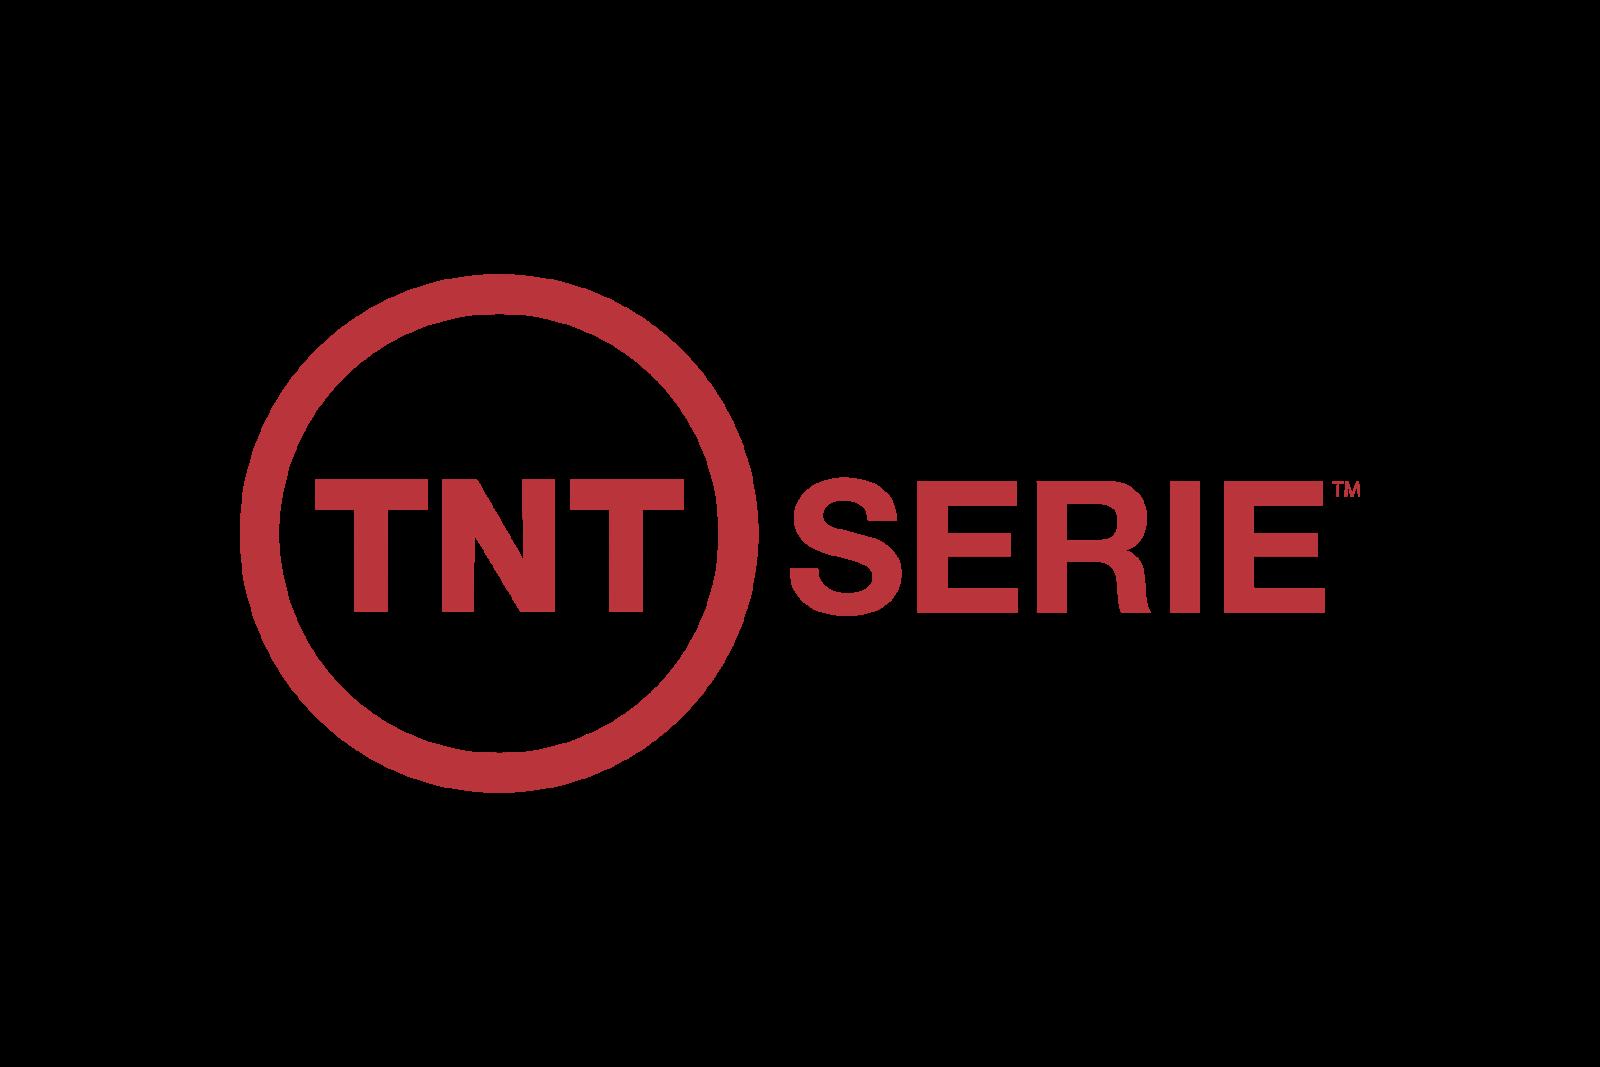 Tnt Serie Live Stream